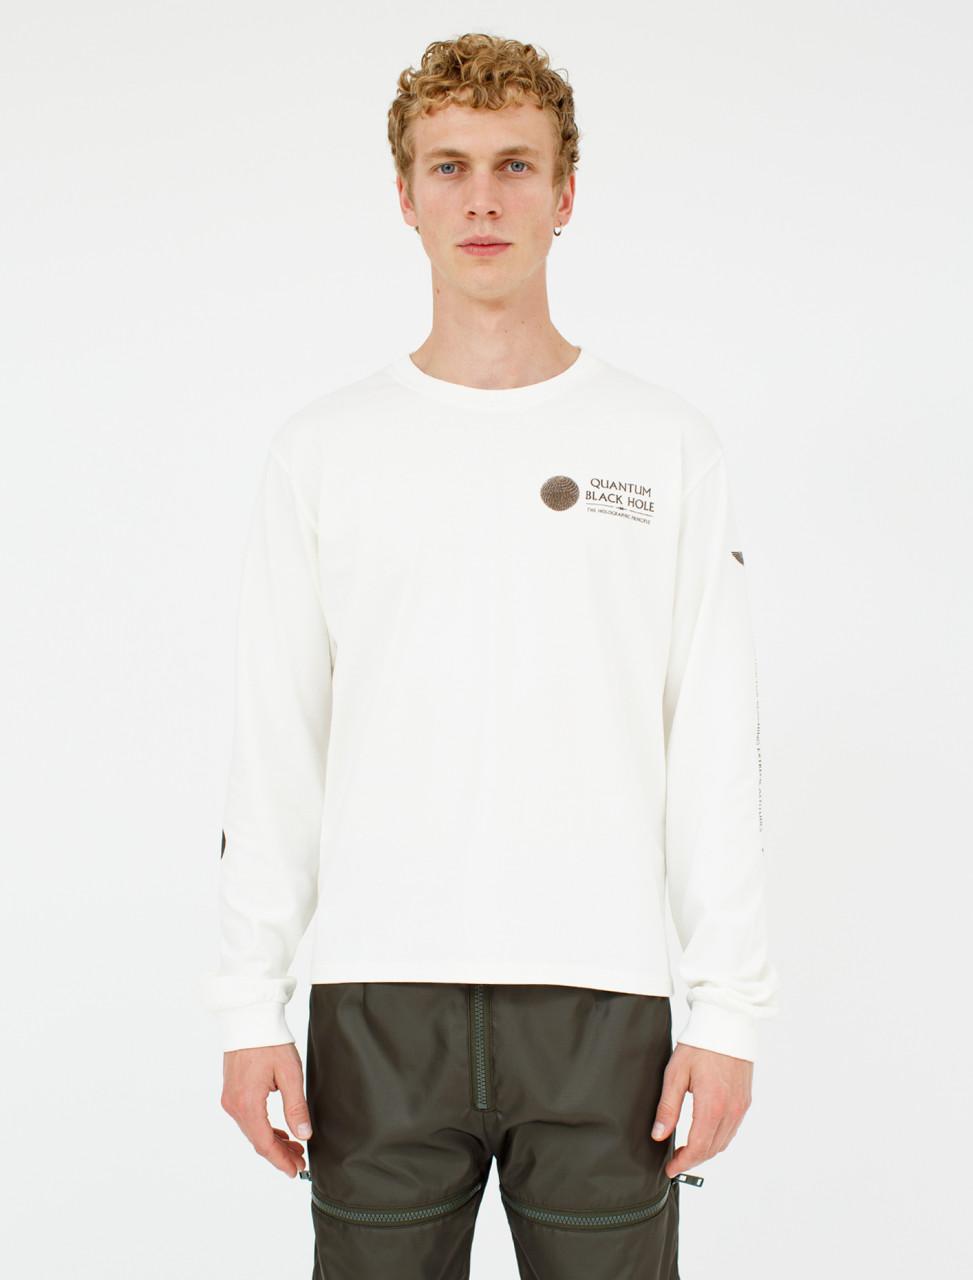 Quantum Black Hole T-Shirt